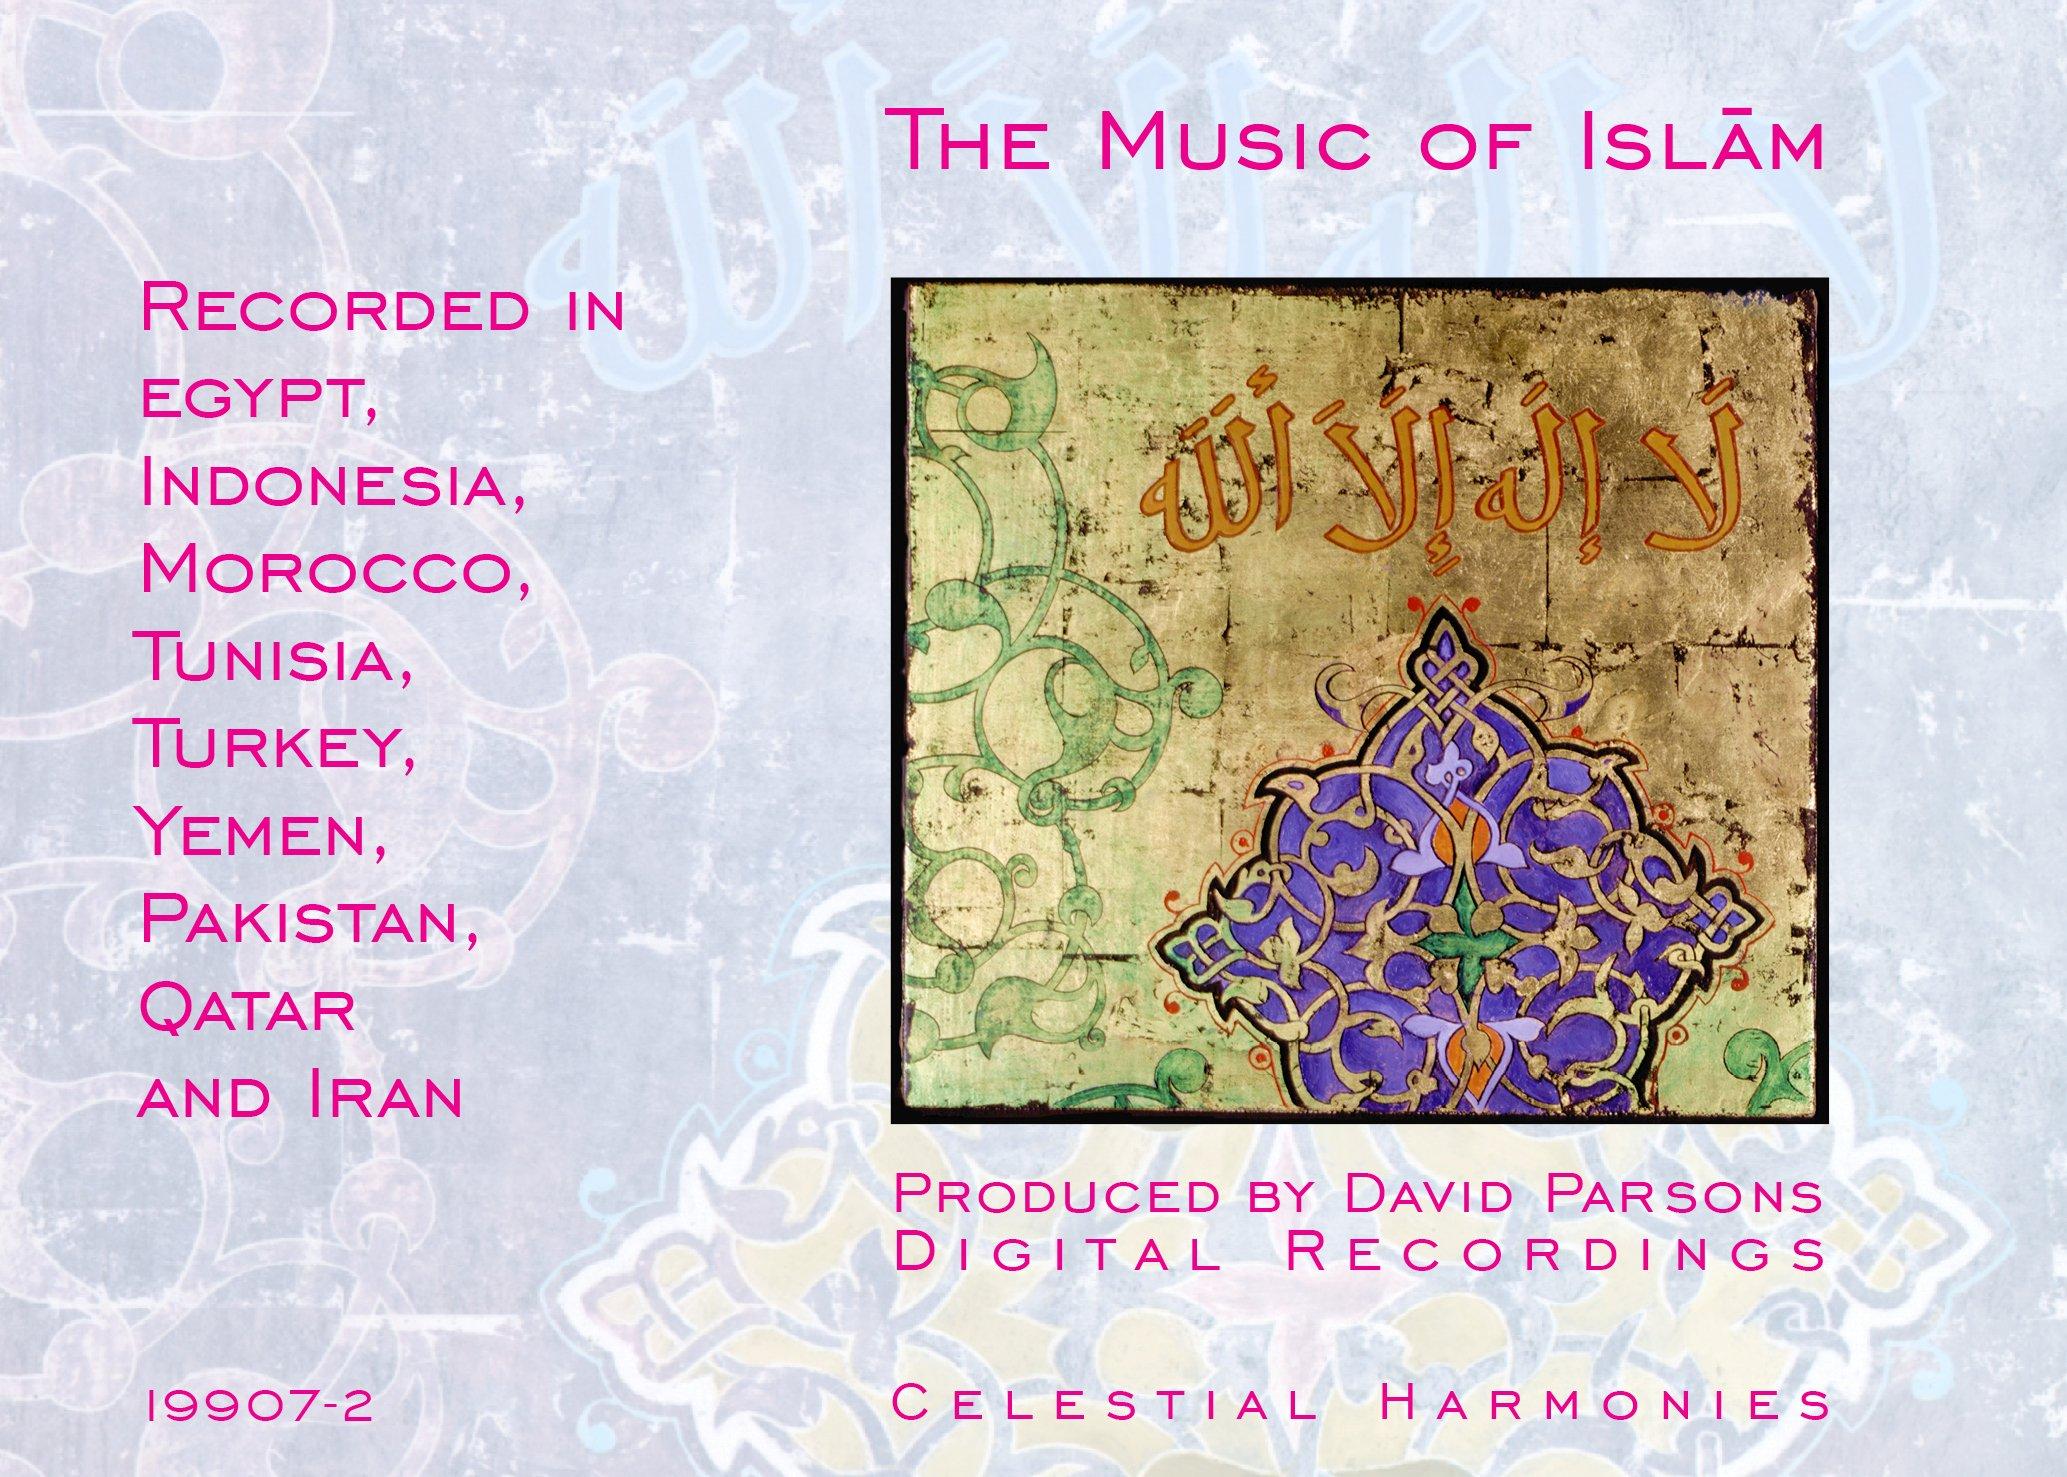 The Music of Islam by Celestial Harmonies